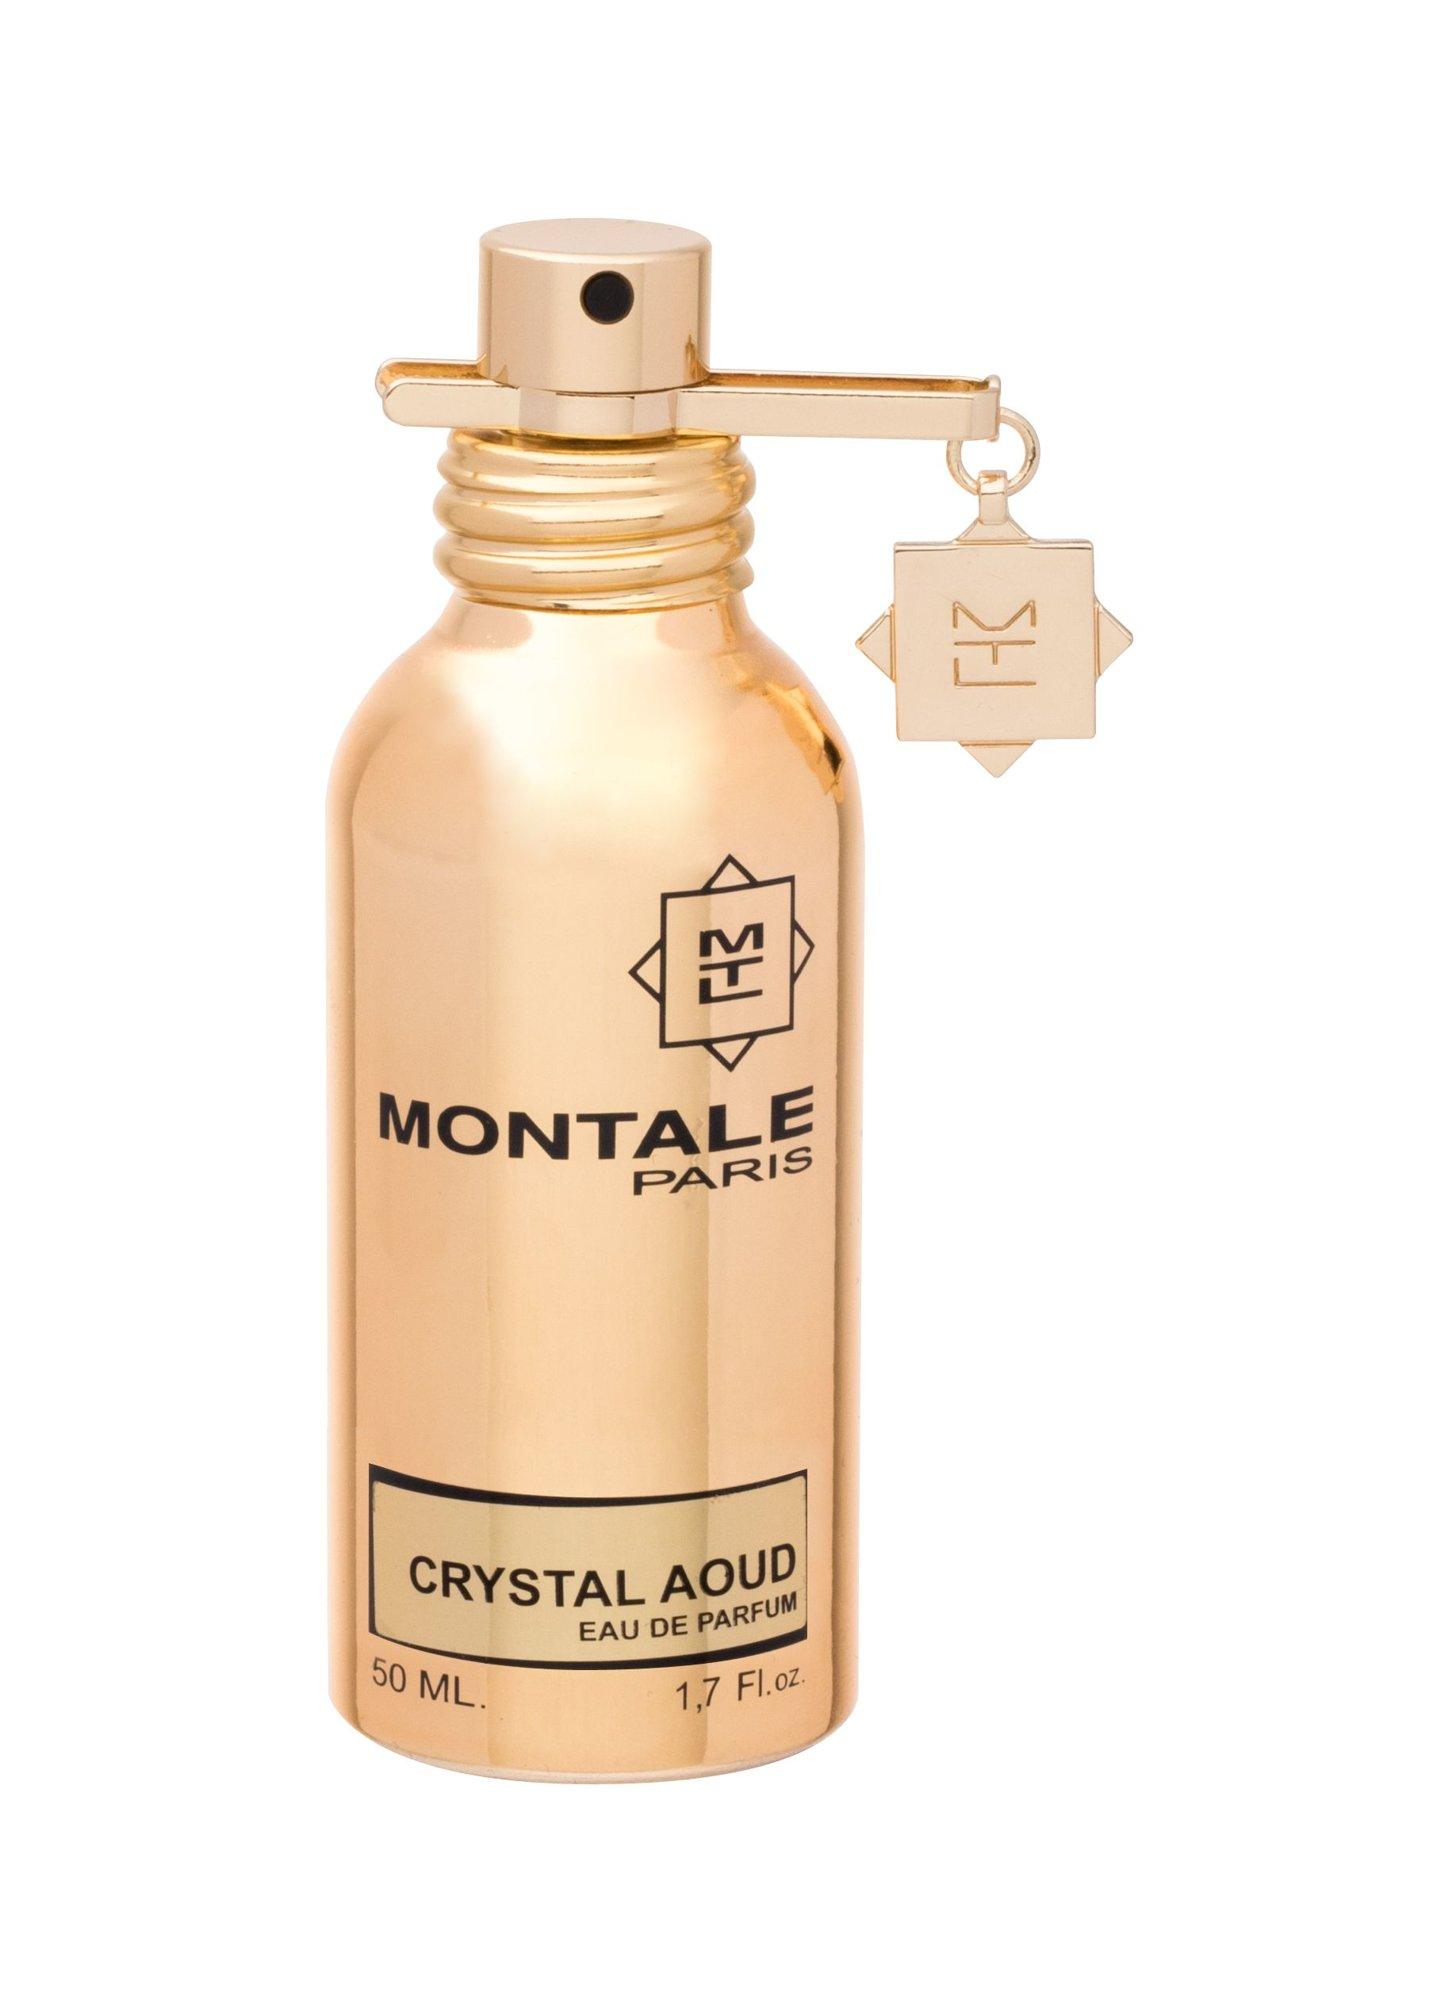 Montale Paris Crystal Aoud EDP 50ml